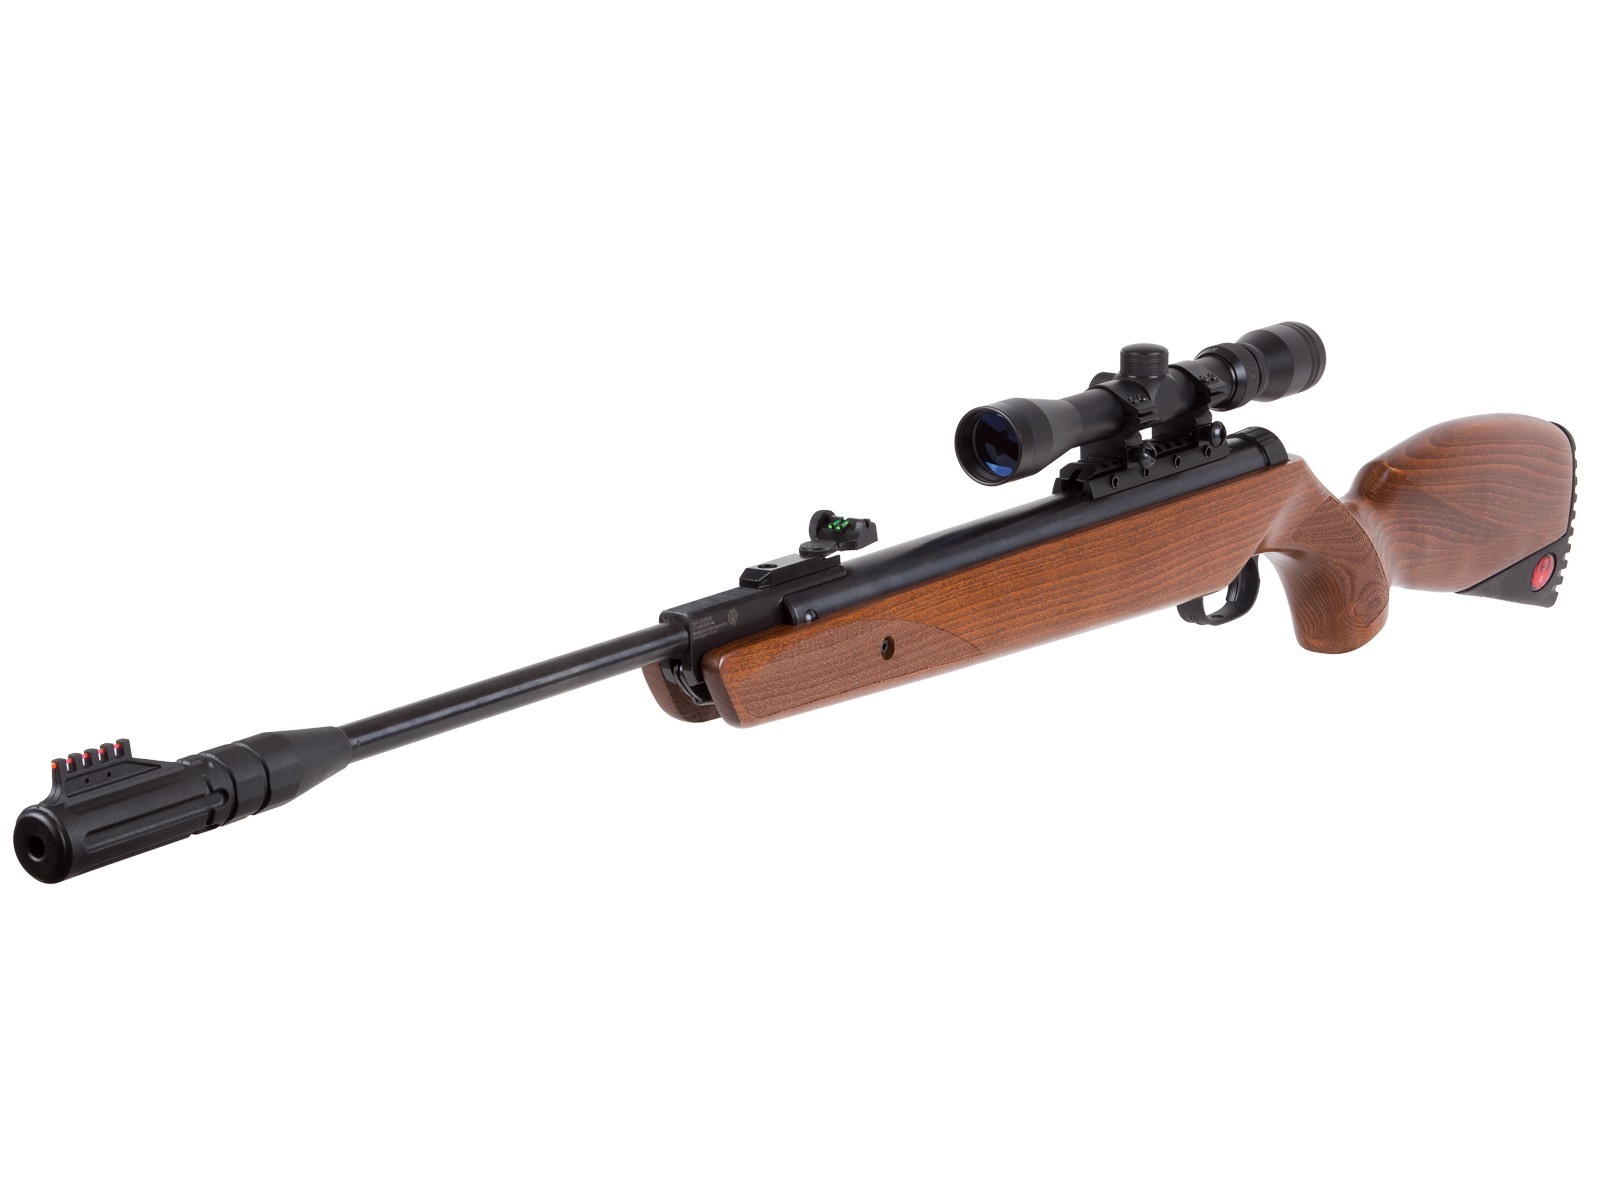 Cheap Ruger Yukon Magnum Air Rifle Combo, Gas Piston 0.22